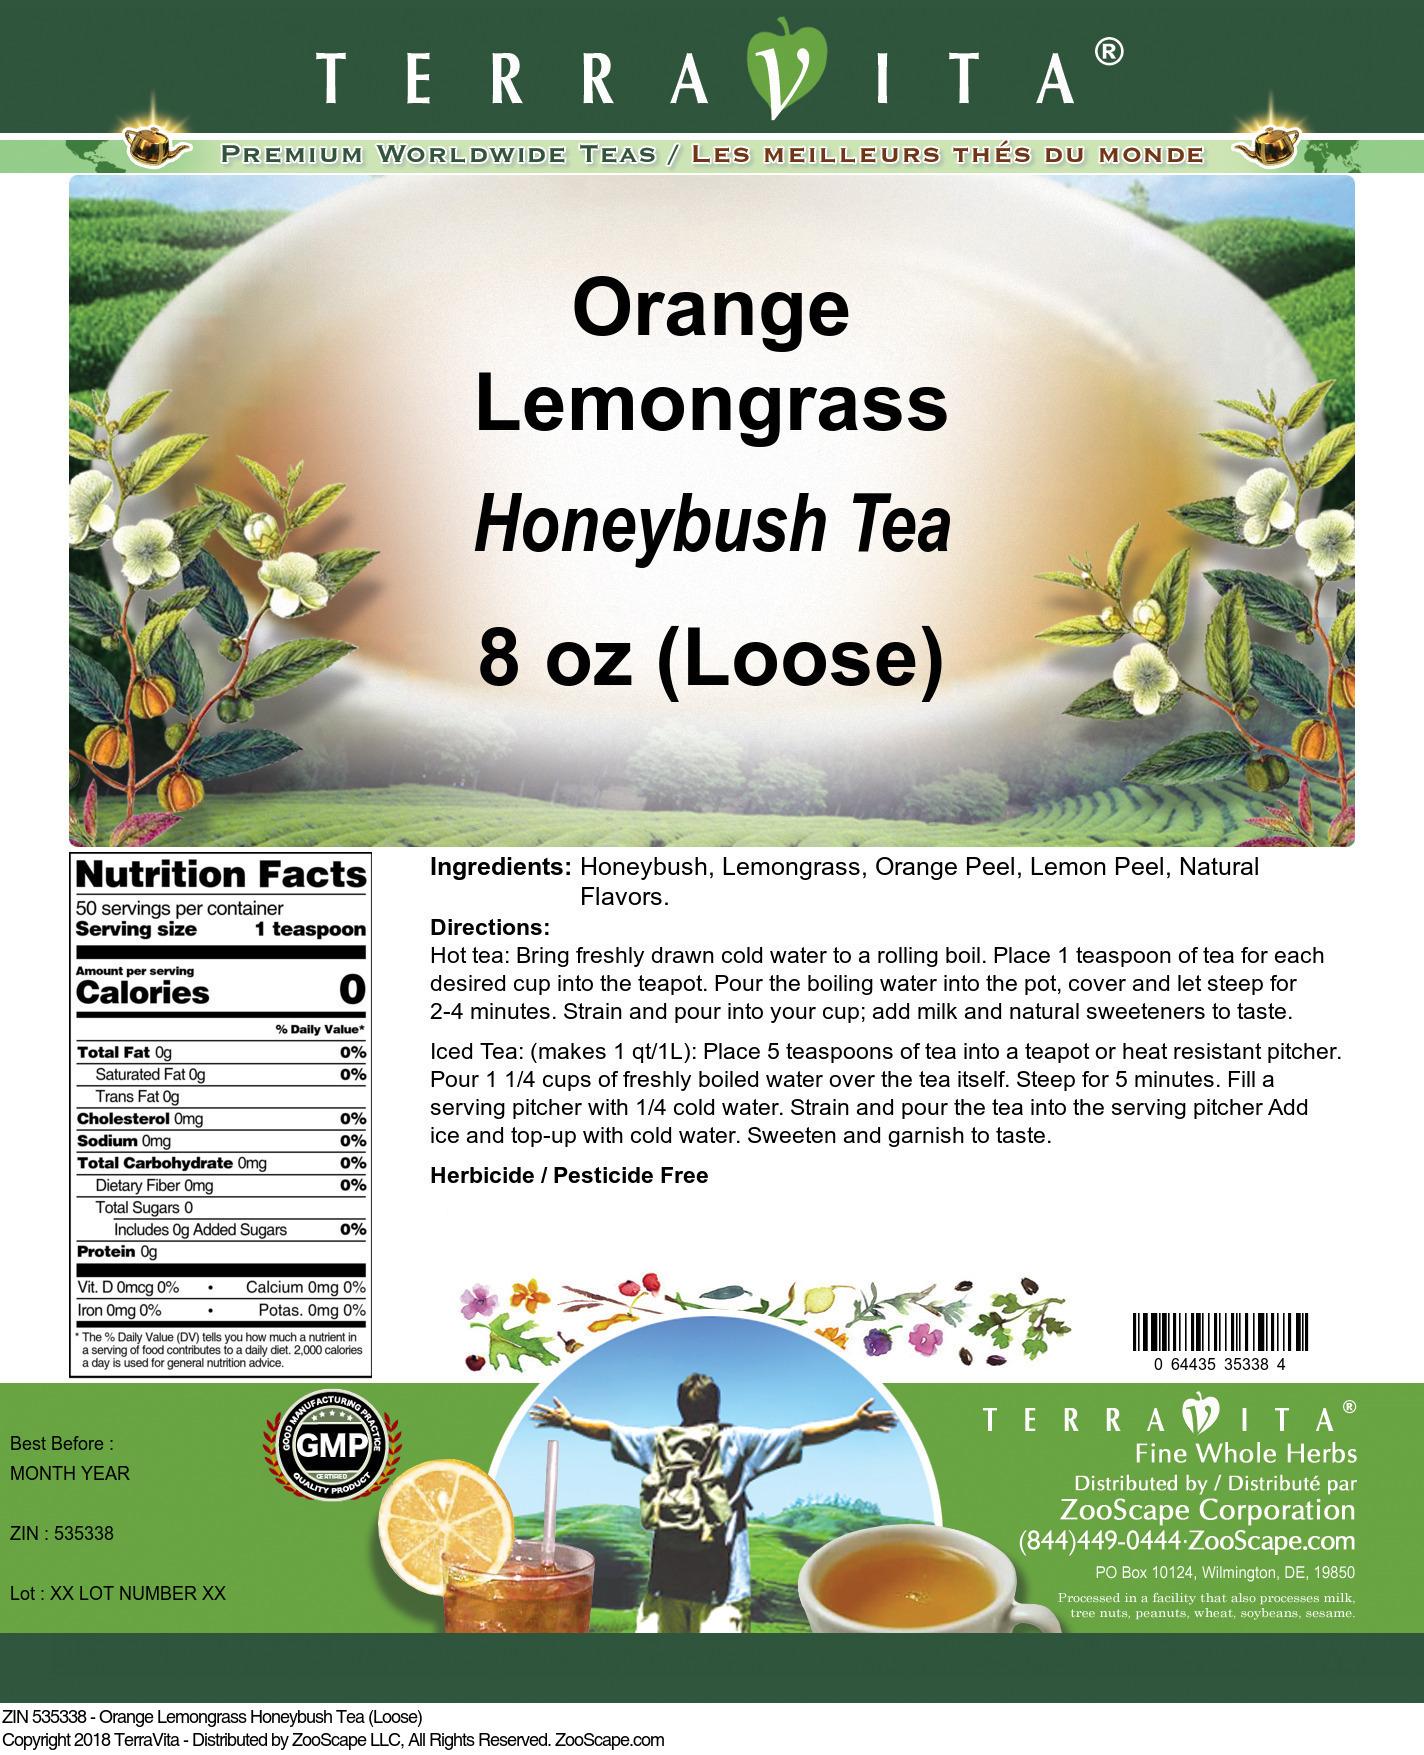 Orange Lemongrass Honeybush Tea (Loose)